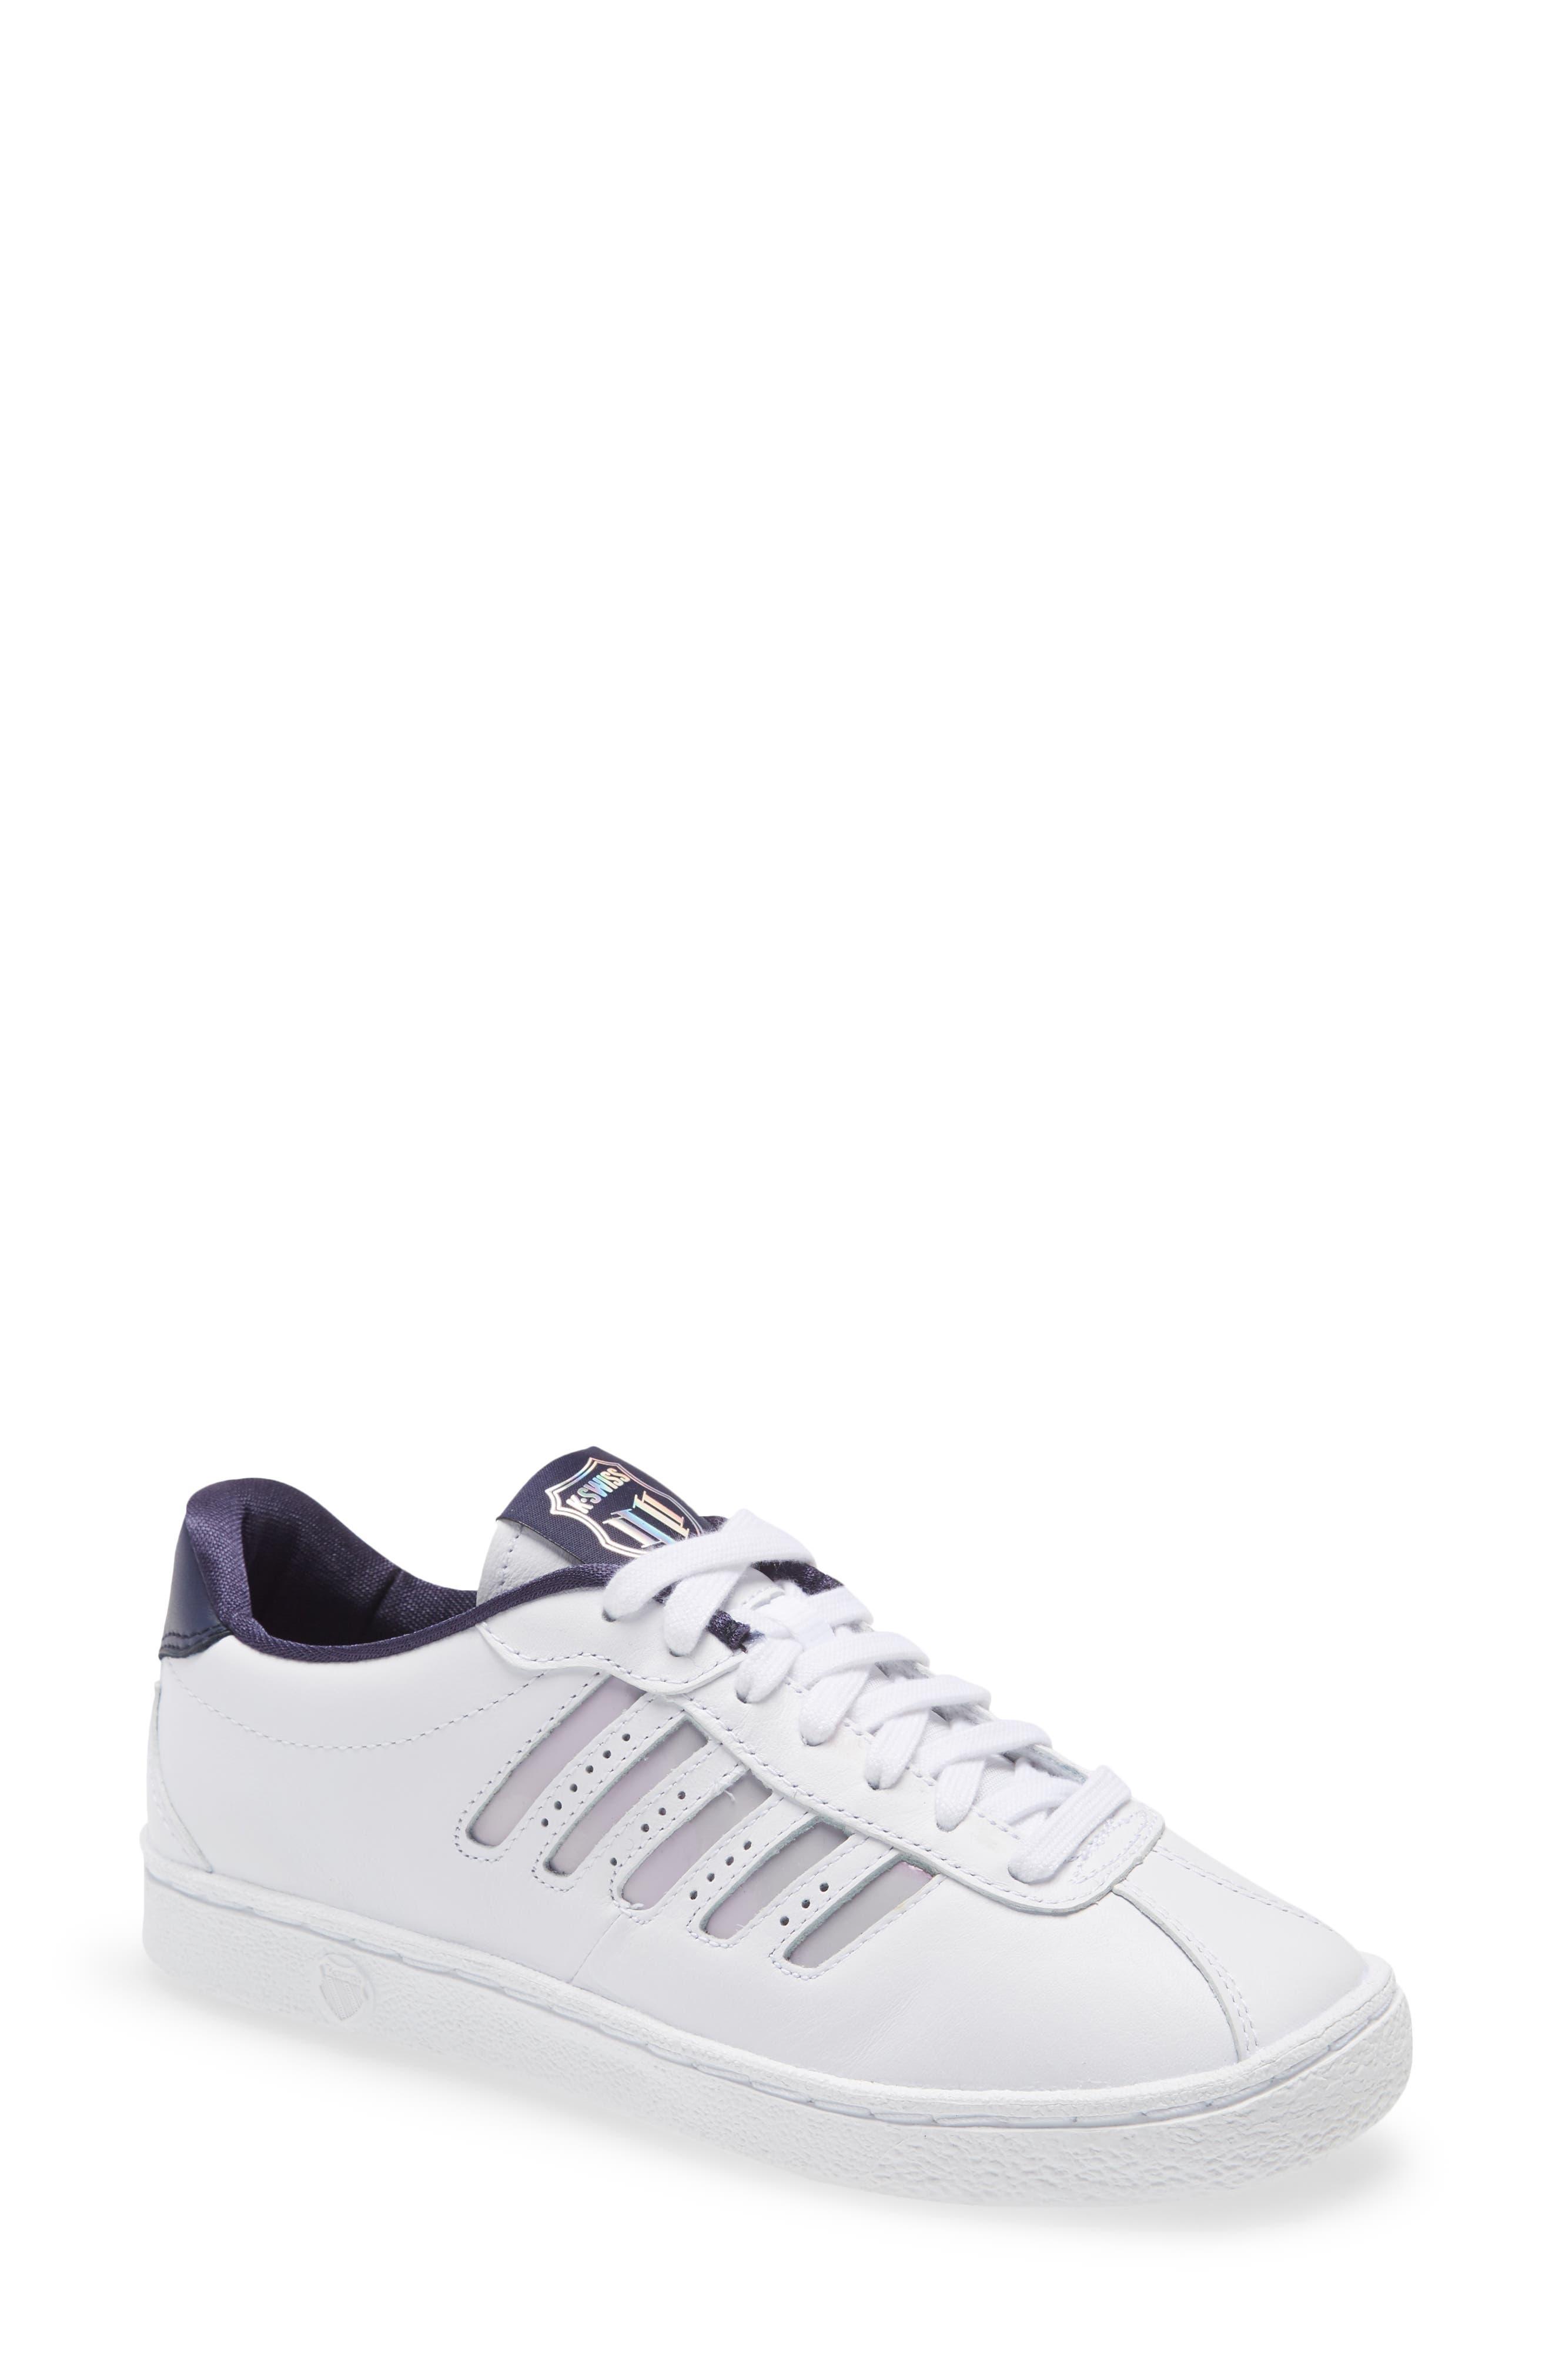 Court Traymore Tennis Shoe